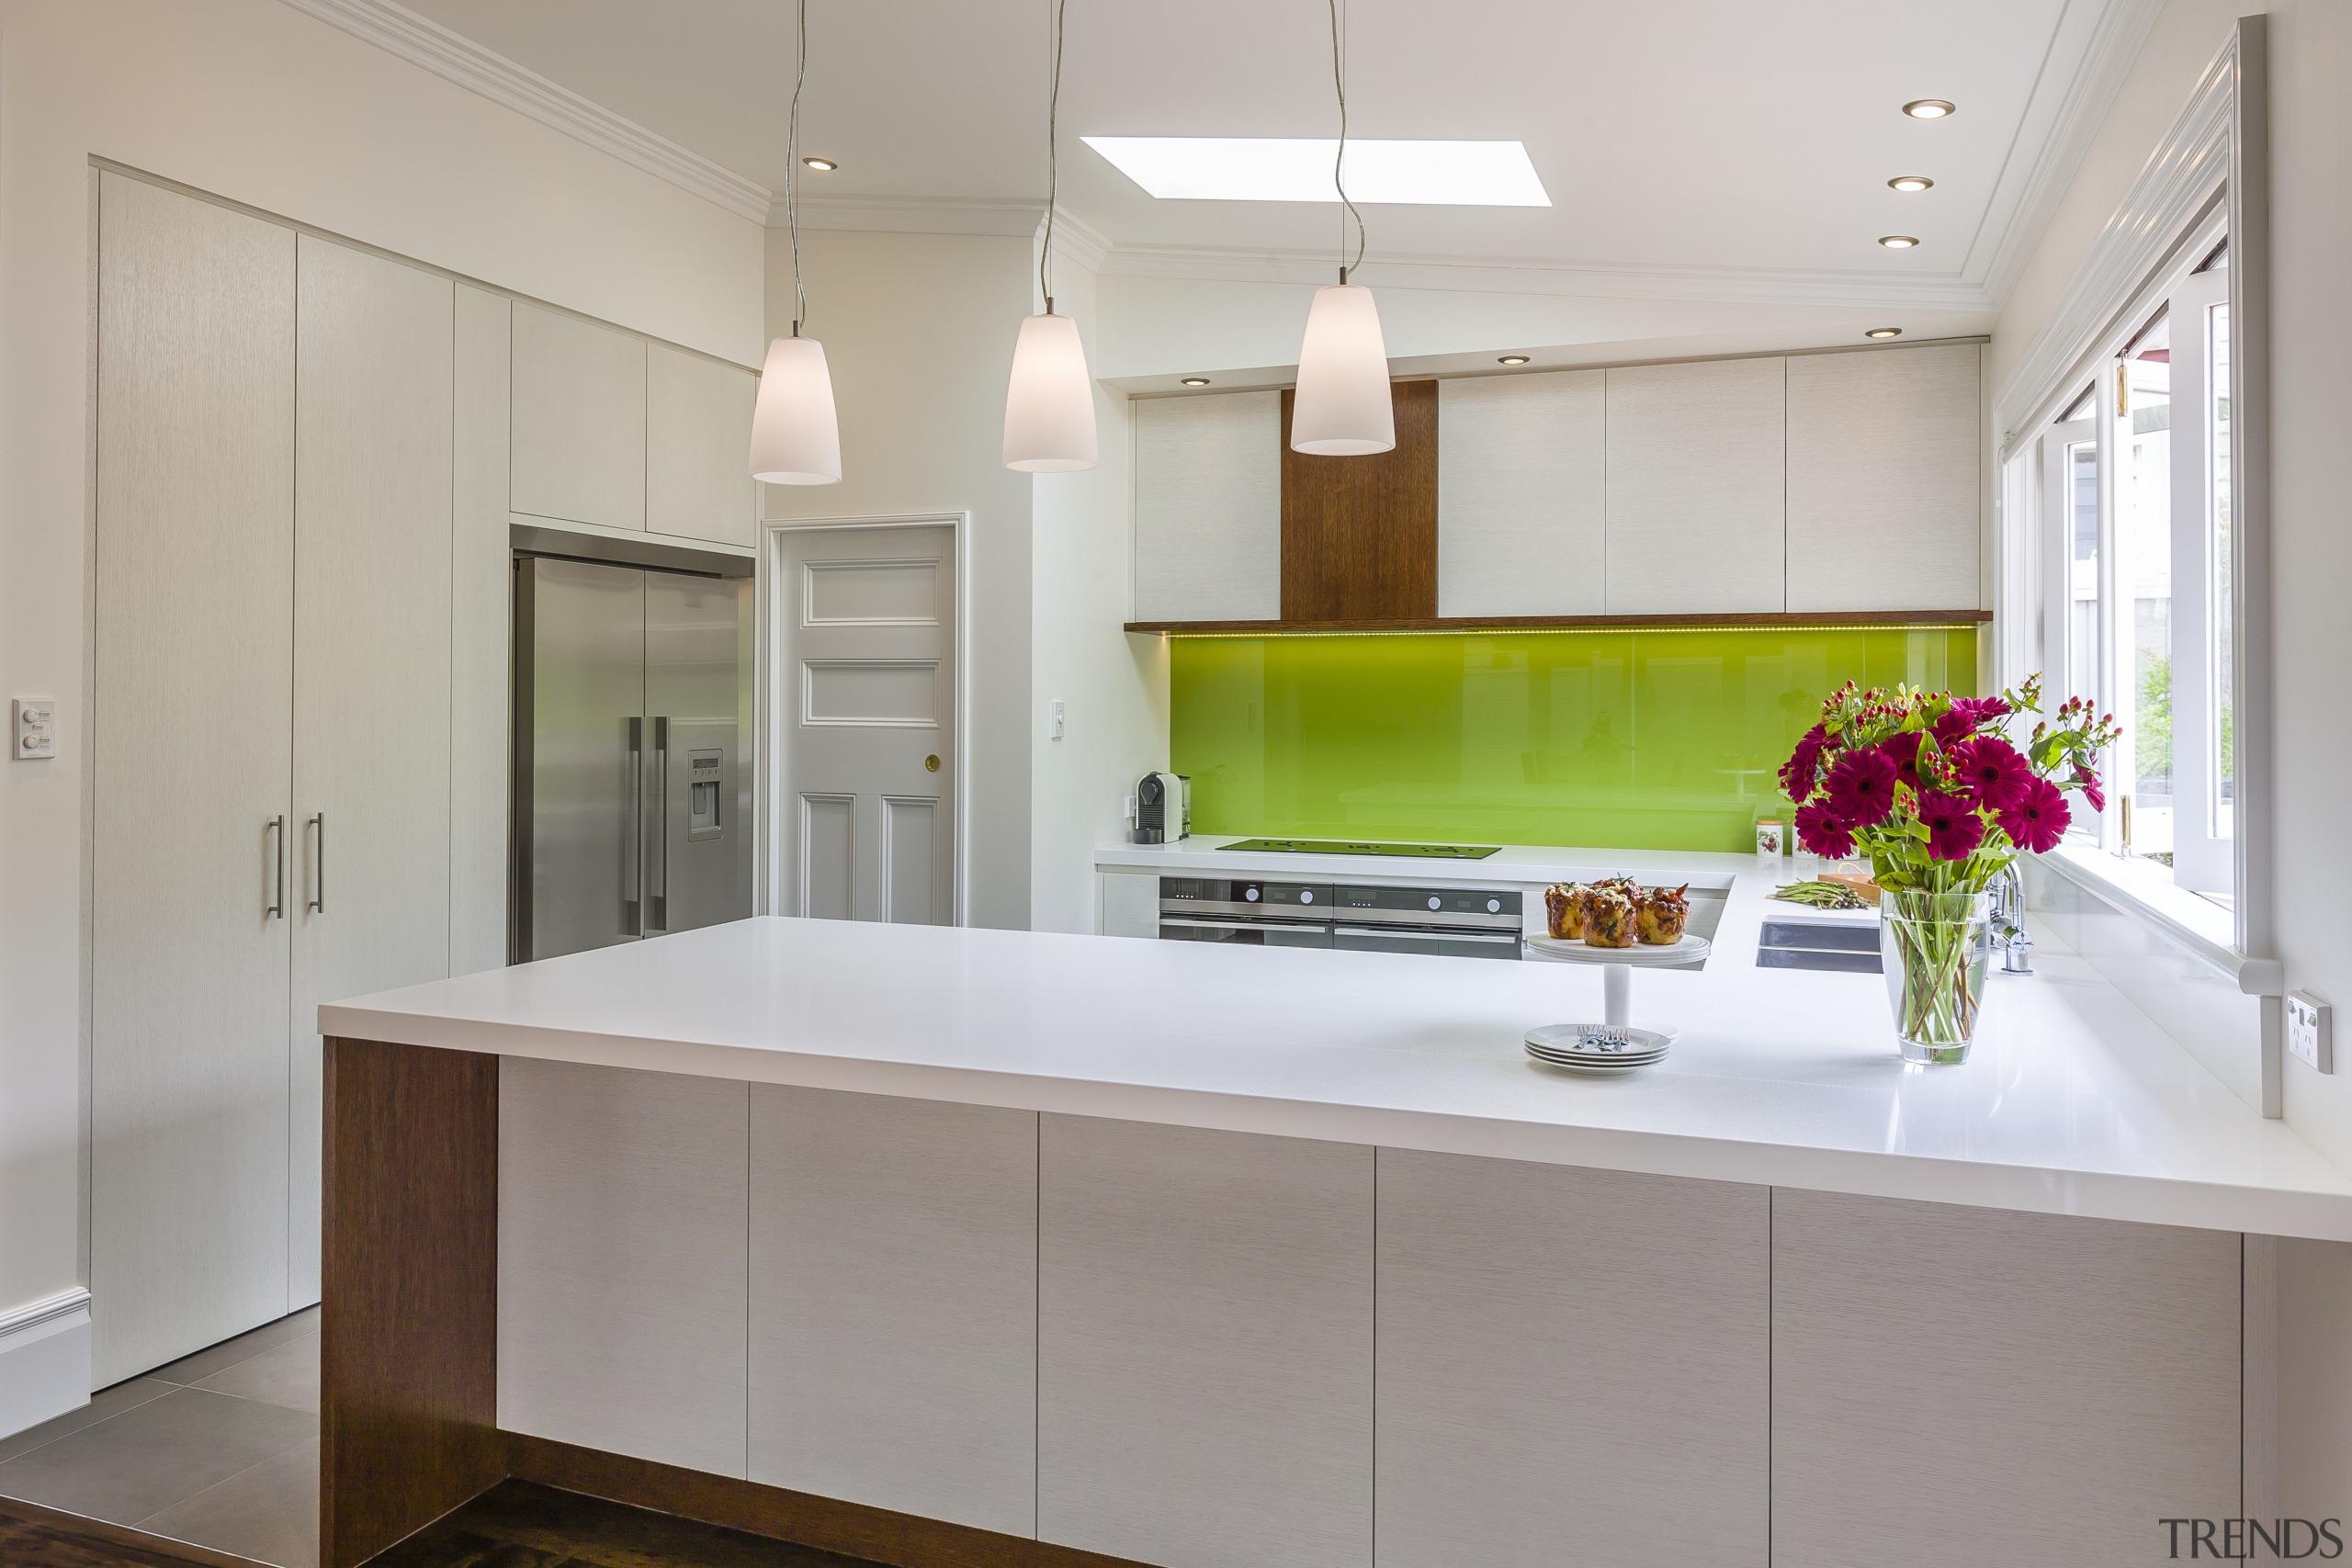 Contemporary kitchen appliances - Contemporary kitchen appliances - cabinetry, countertop, interior design, kitchen, real estate, room, gray